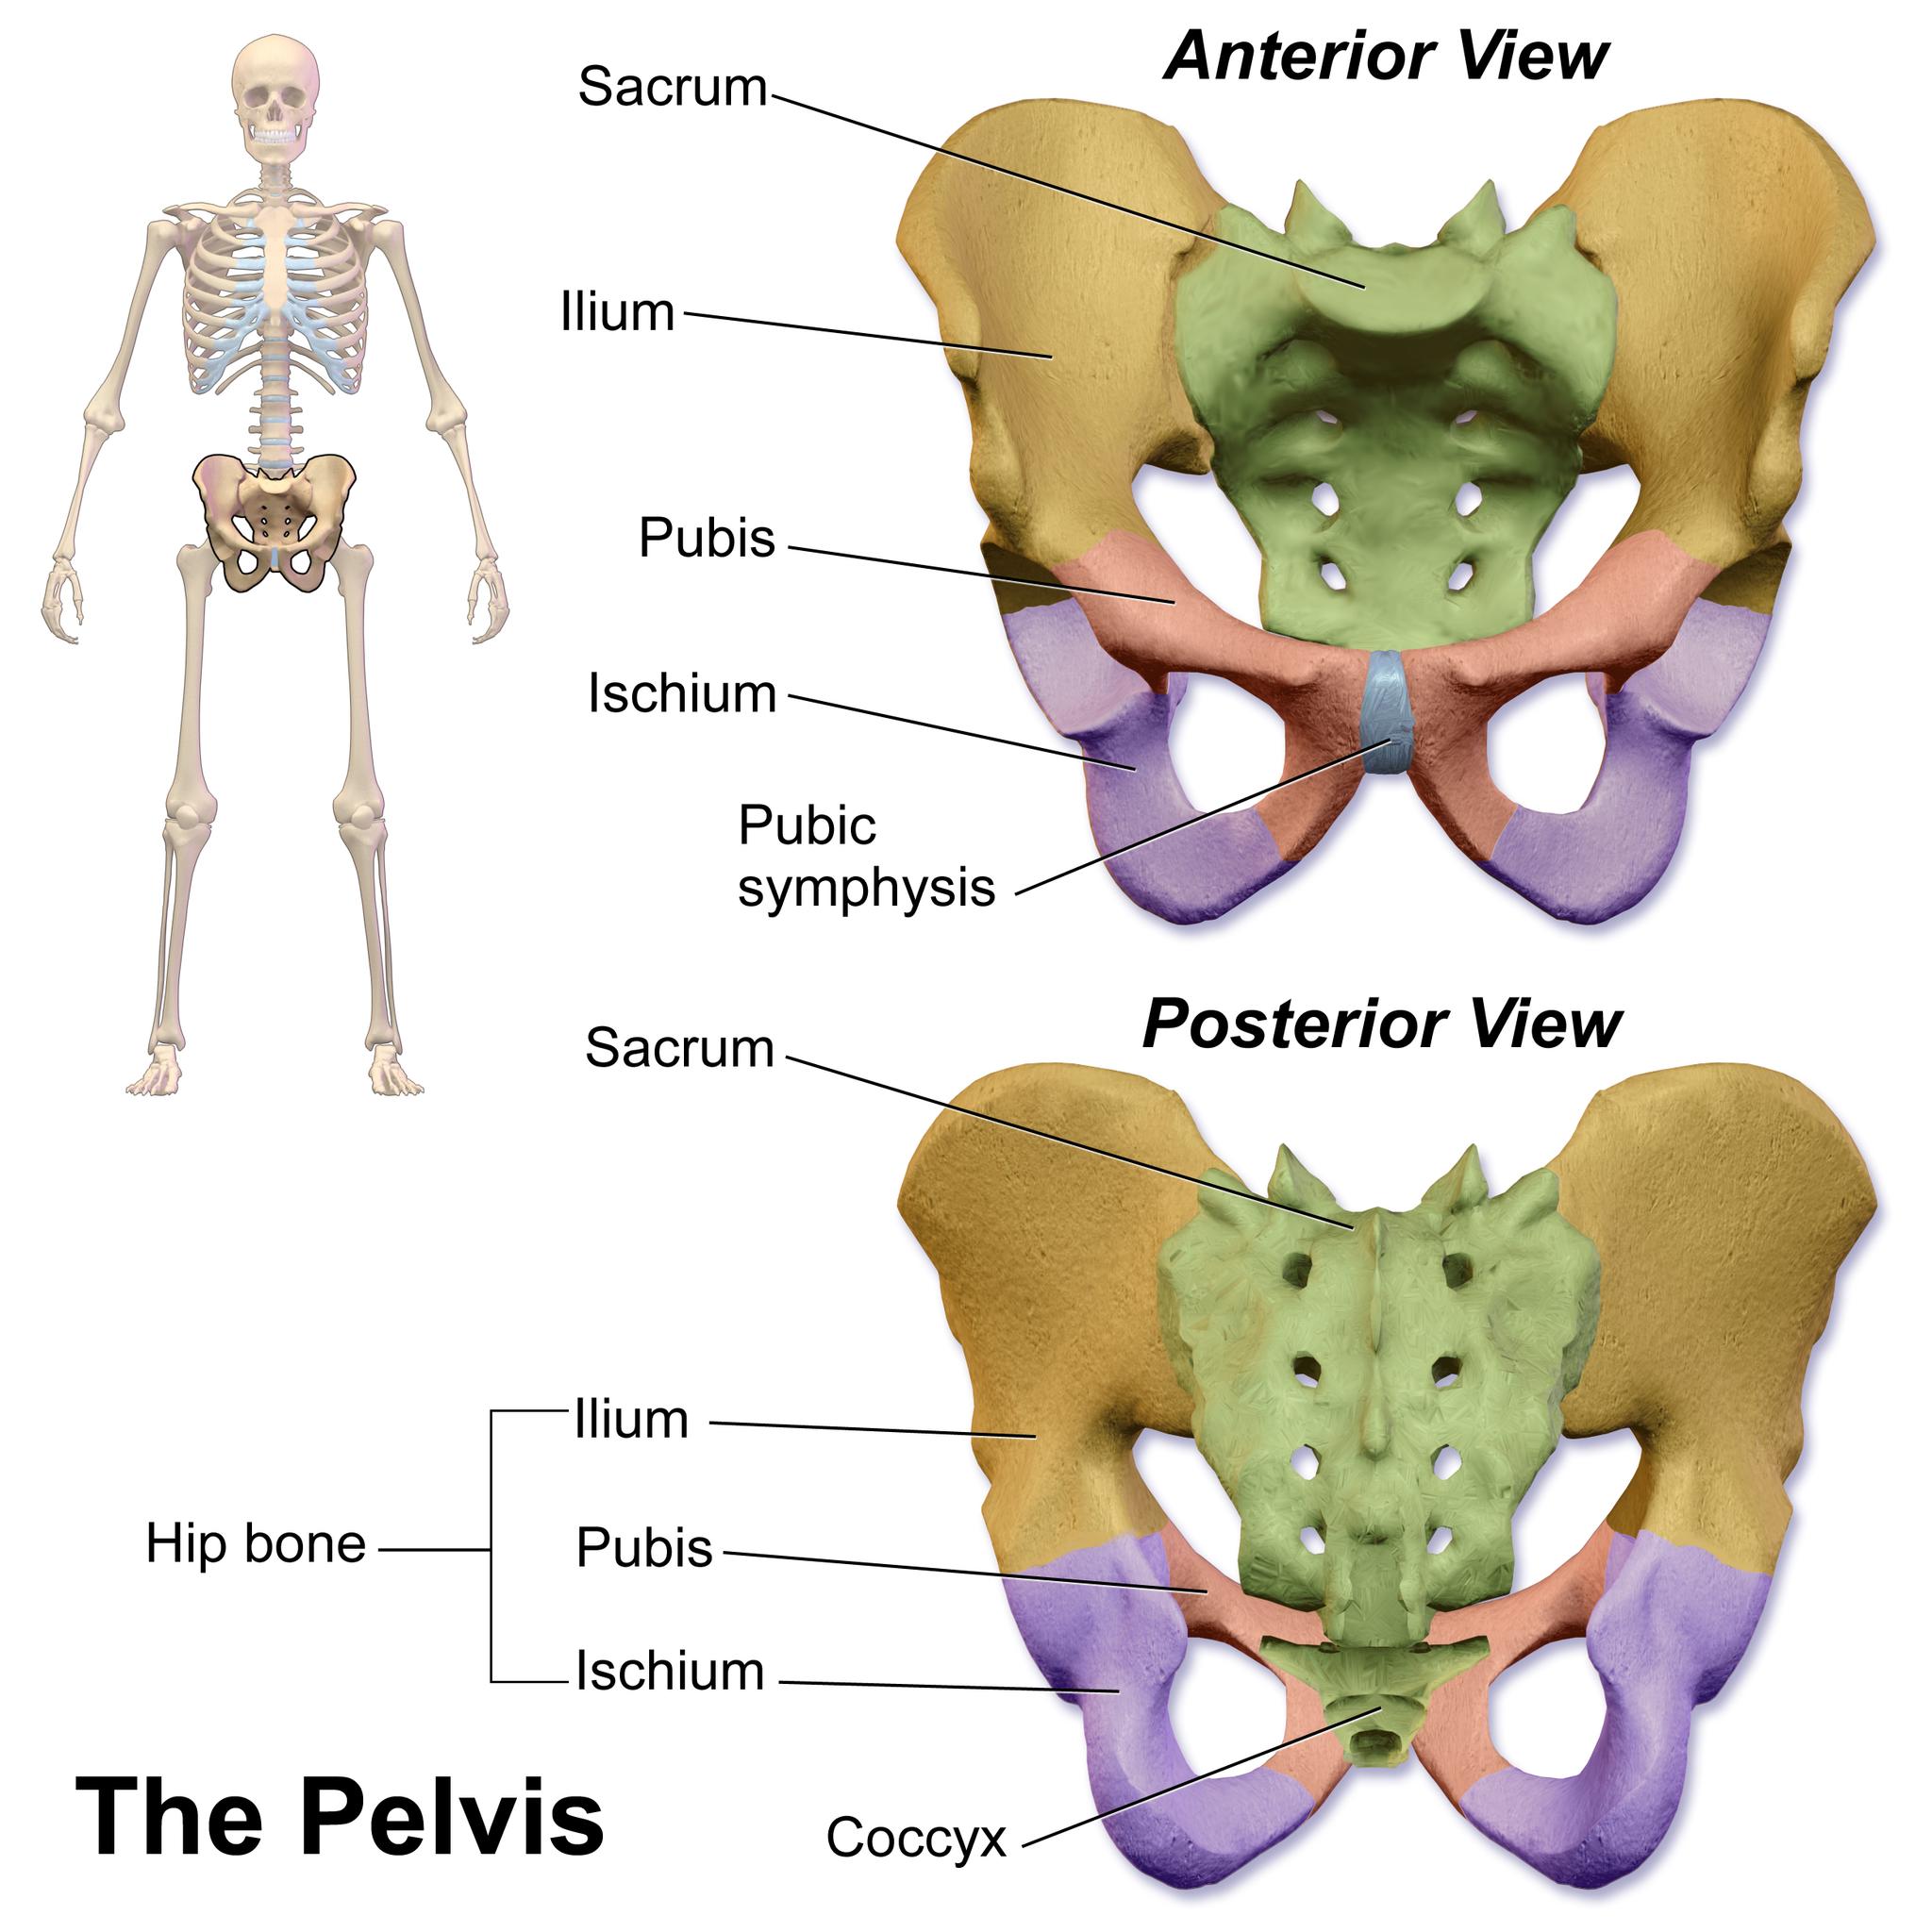 11.3.15 Bones of the Pelvic Girdle